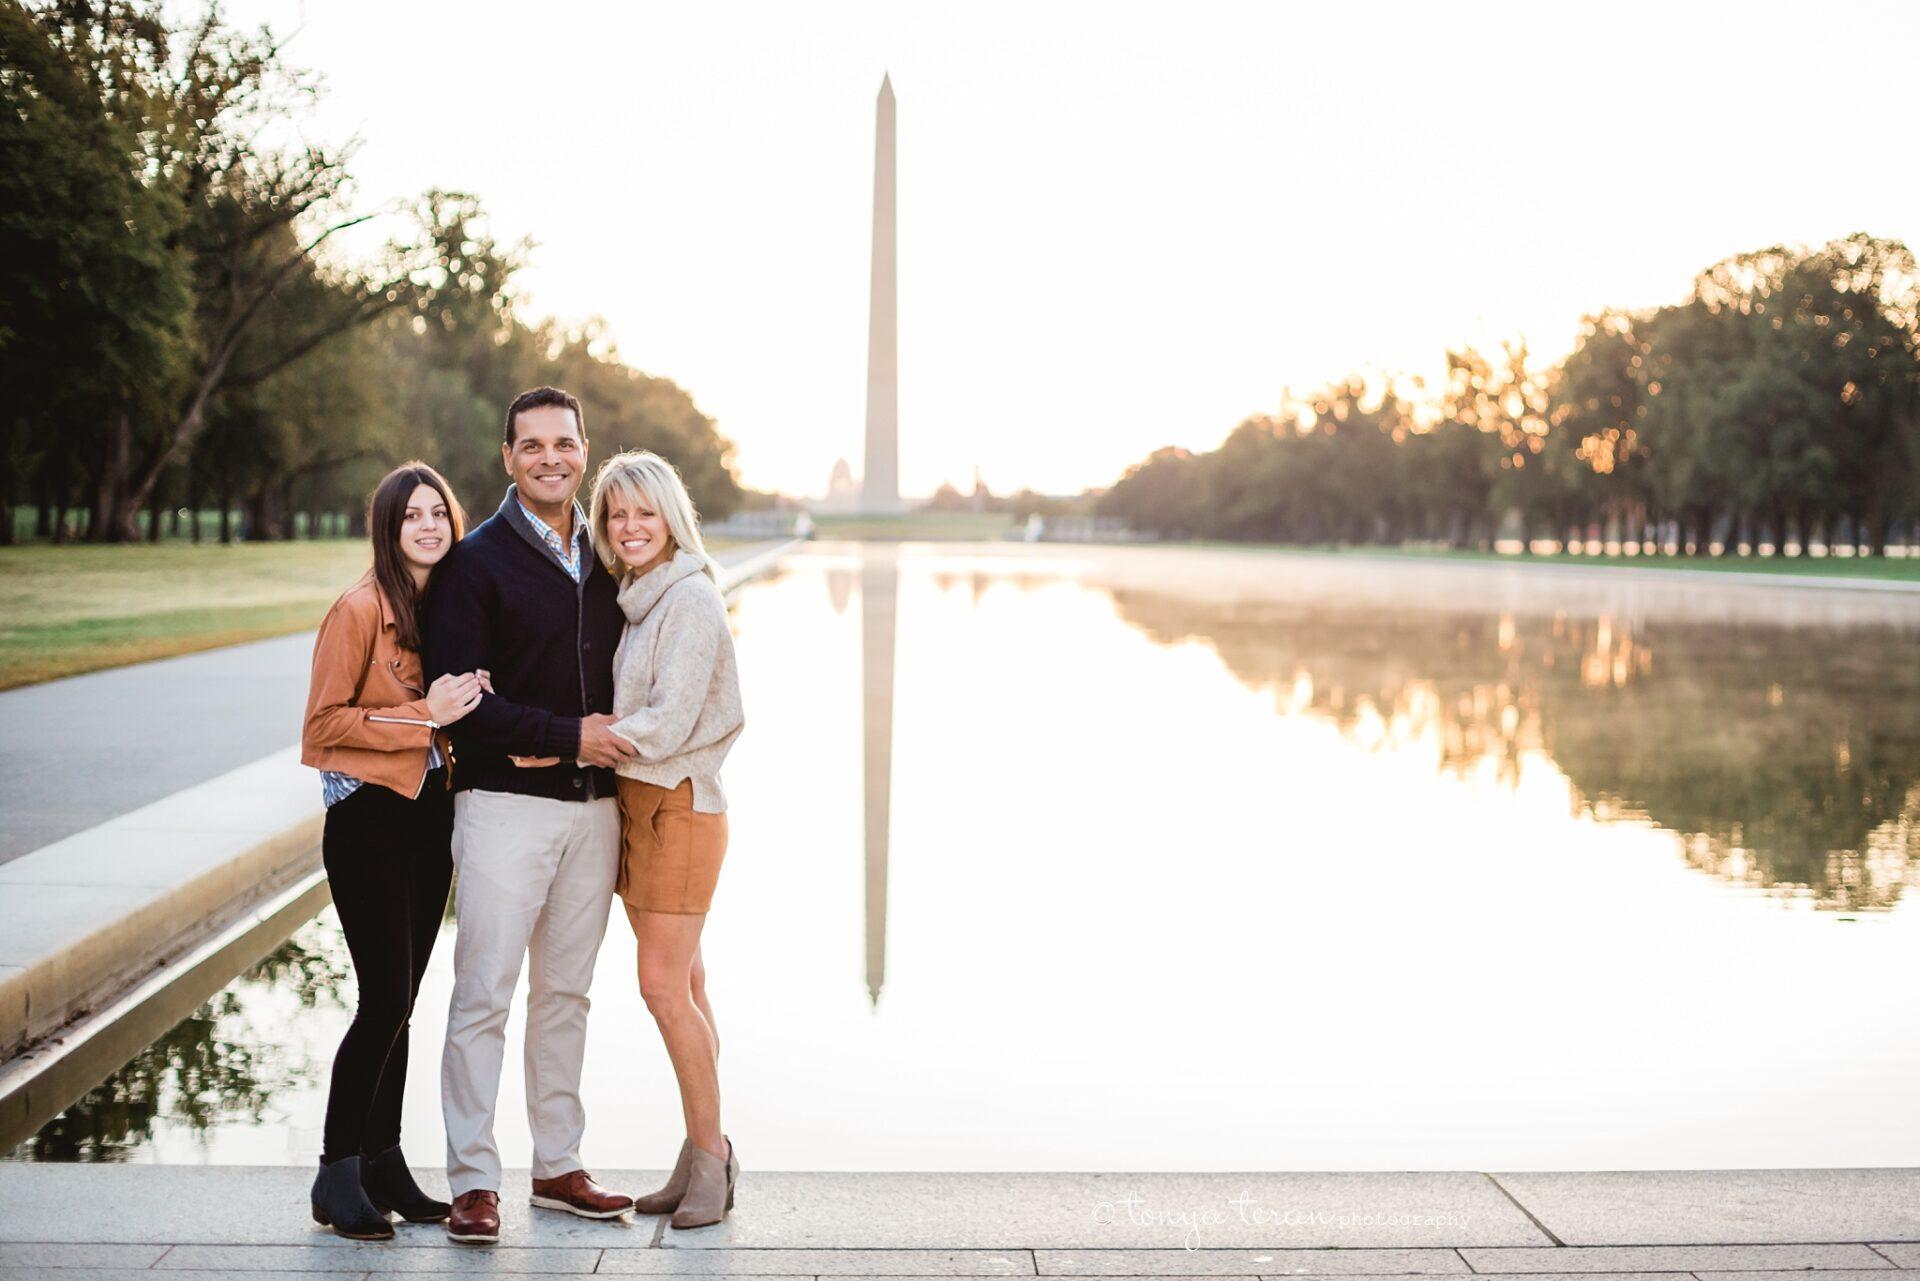 dc-family-photographer-washington-dc-monuments